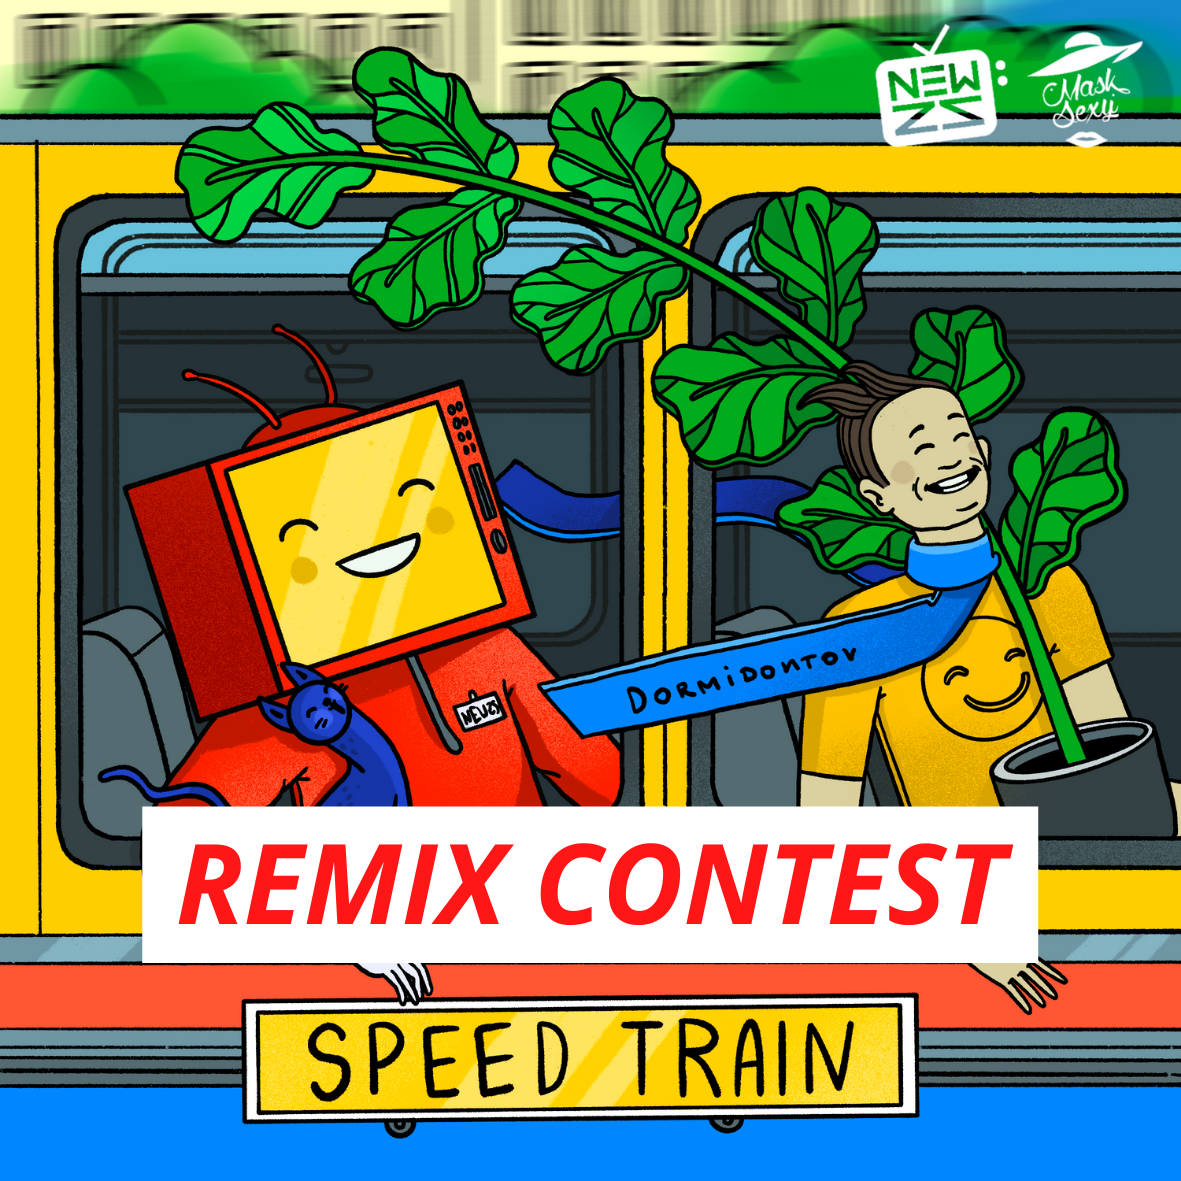 SPEED TRAIN / REMIX CONTEST